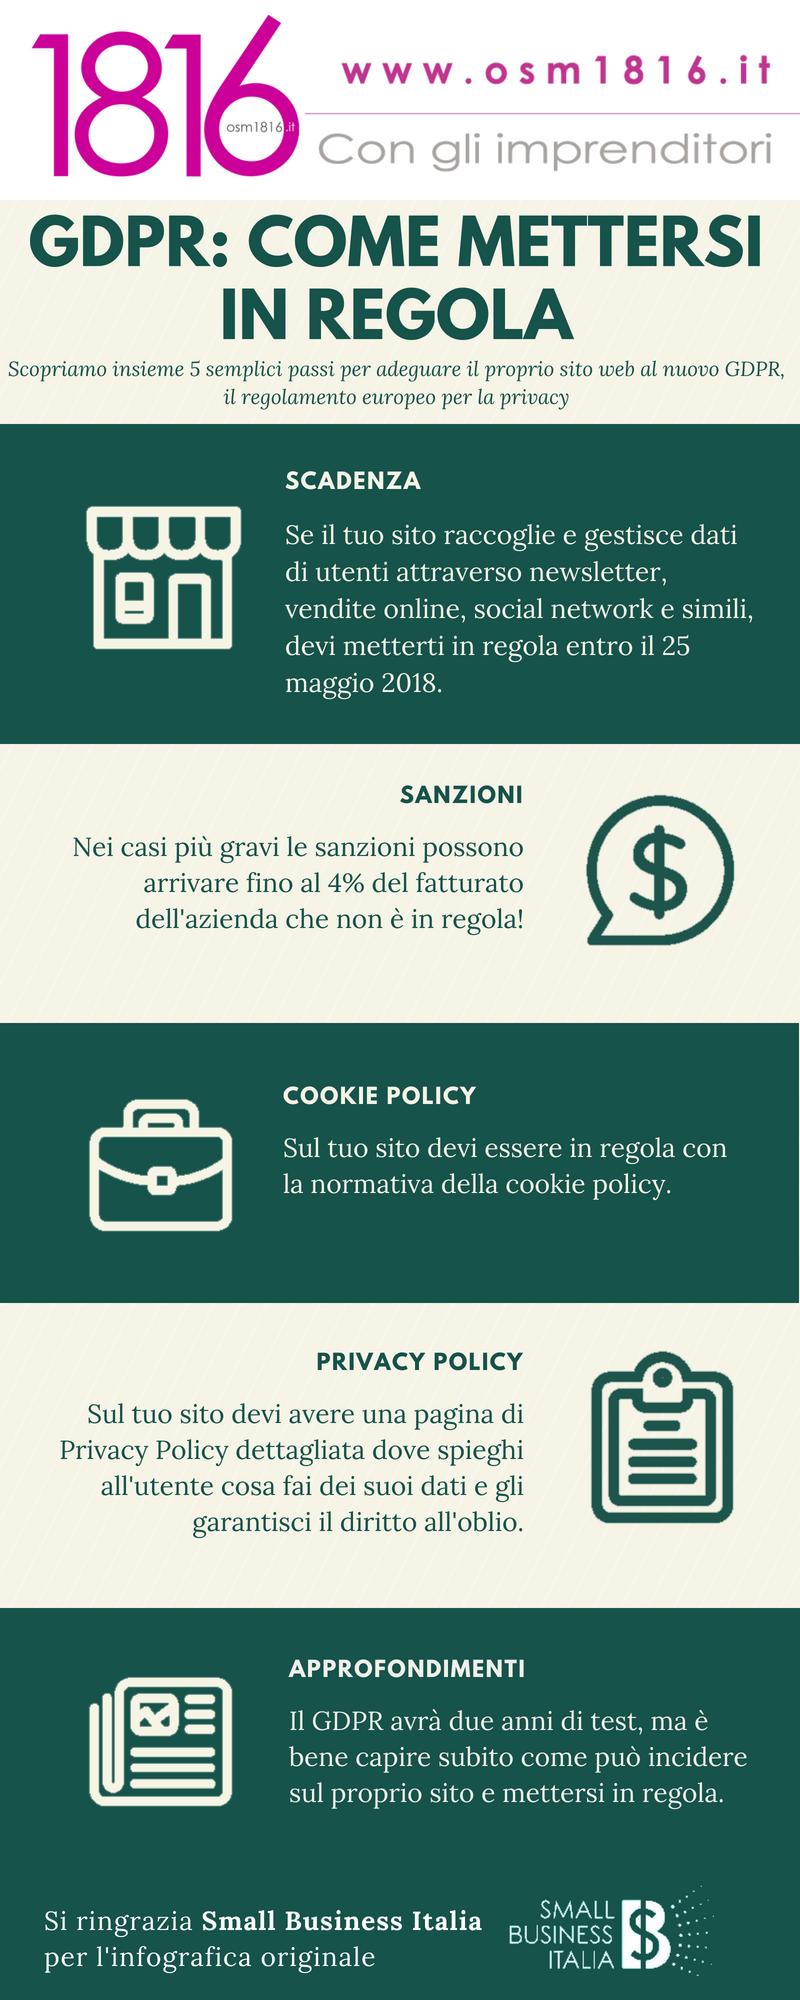 GDPR – come mettersi in regola